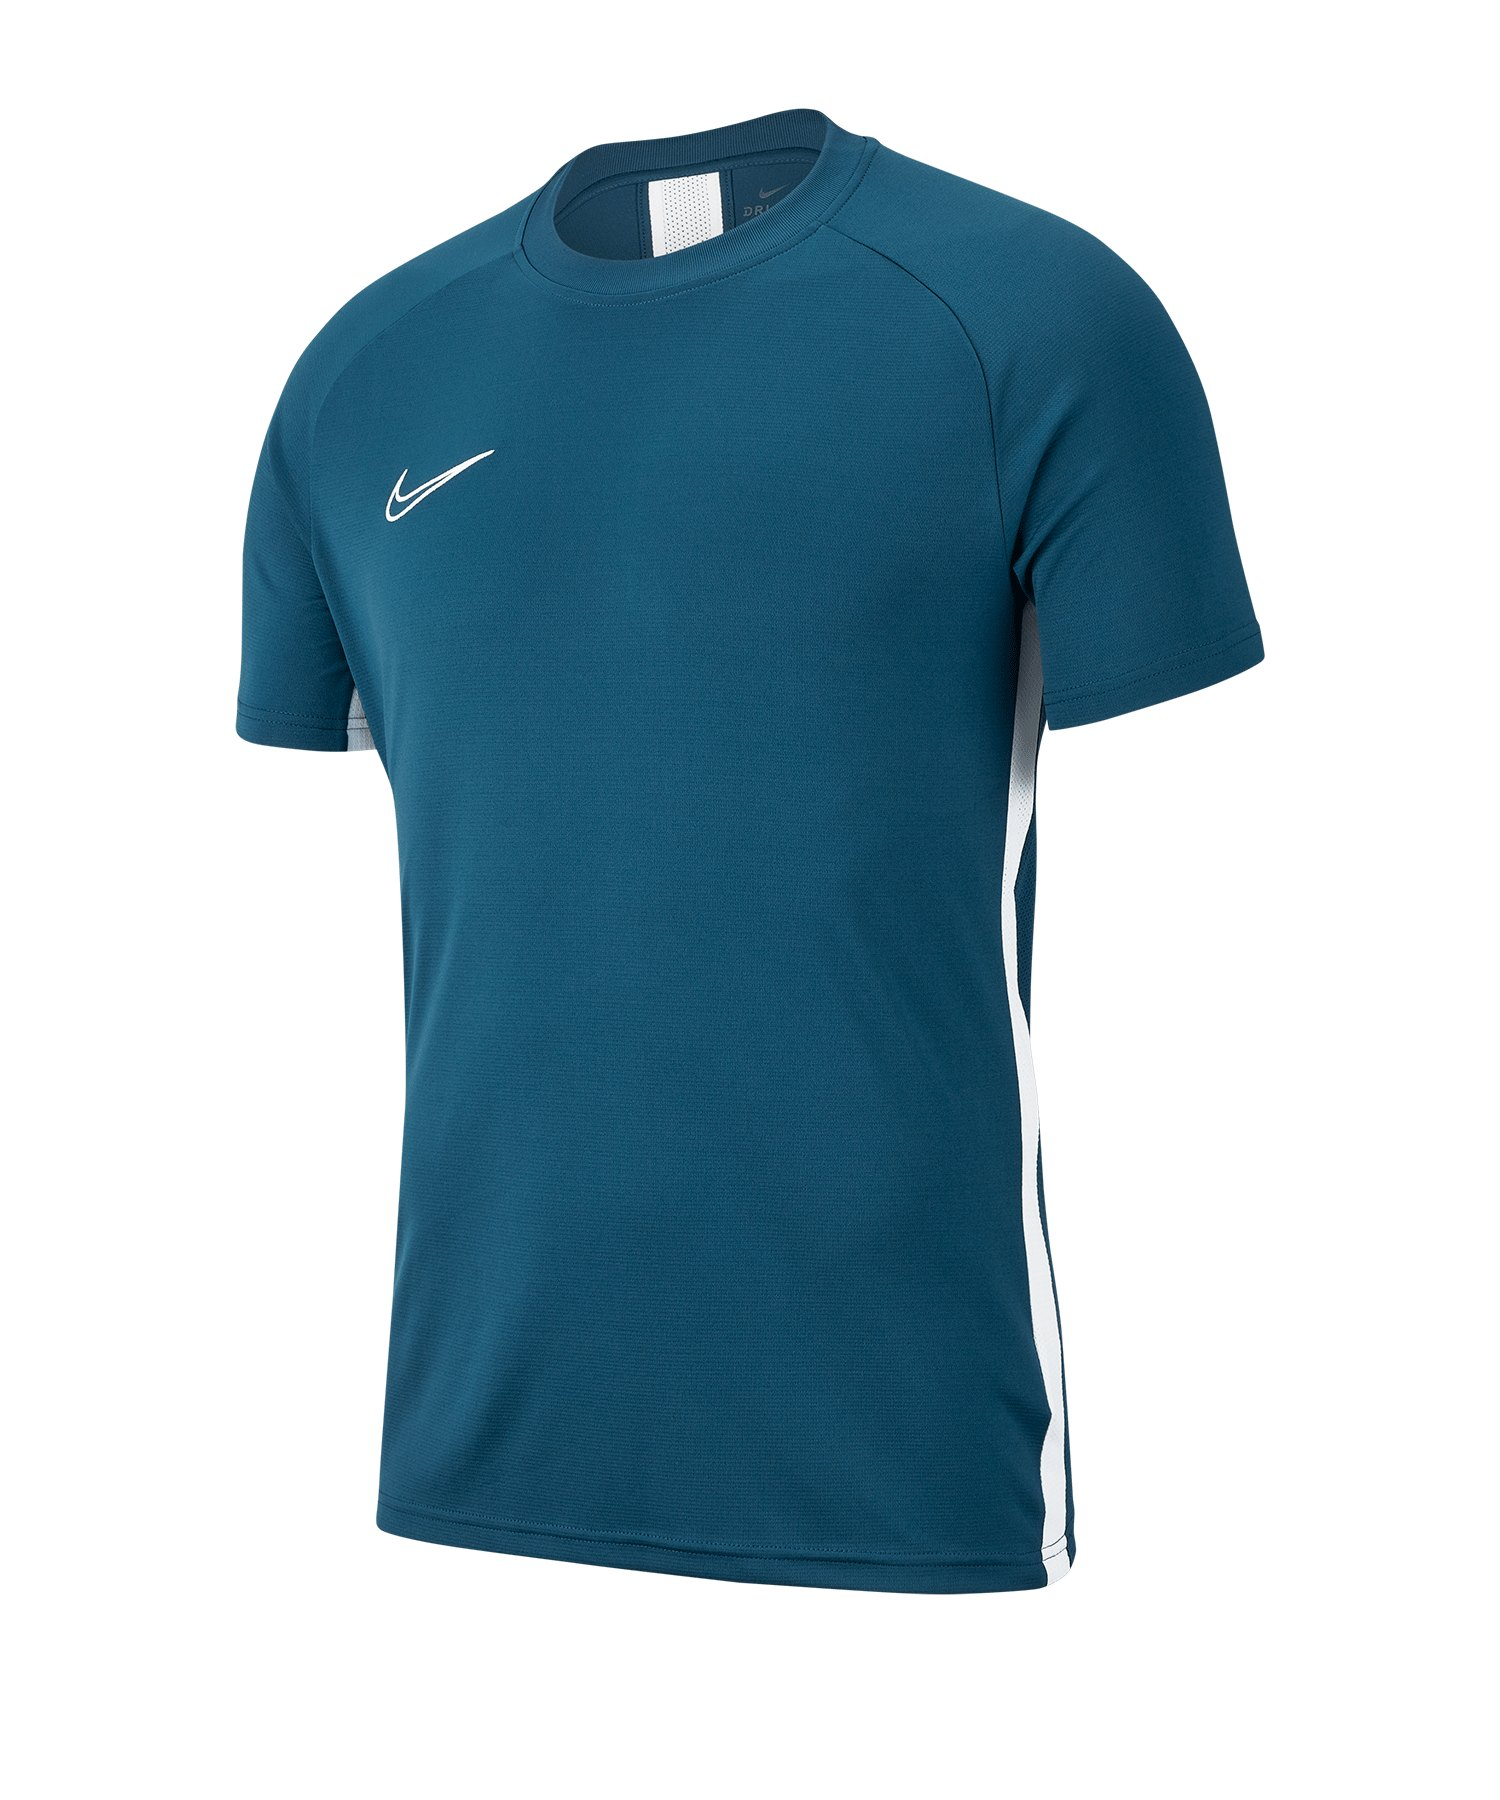 Nike Academy 19 Trainingstop T-Shirt Blau F404 - blau